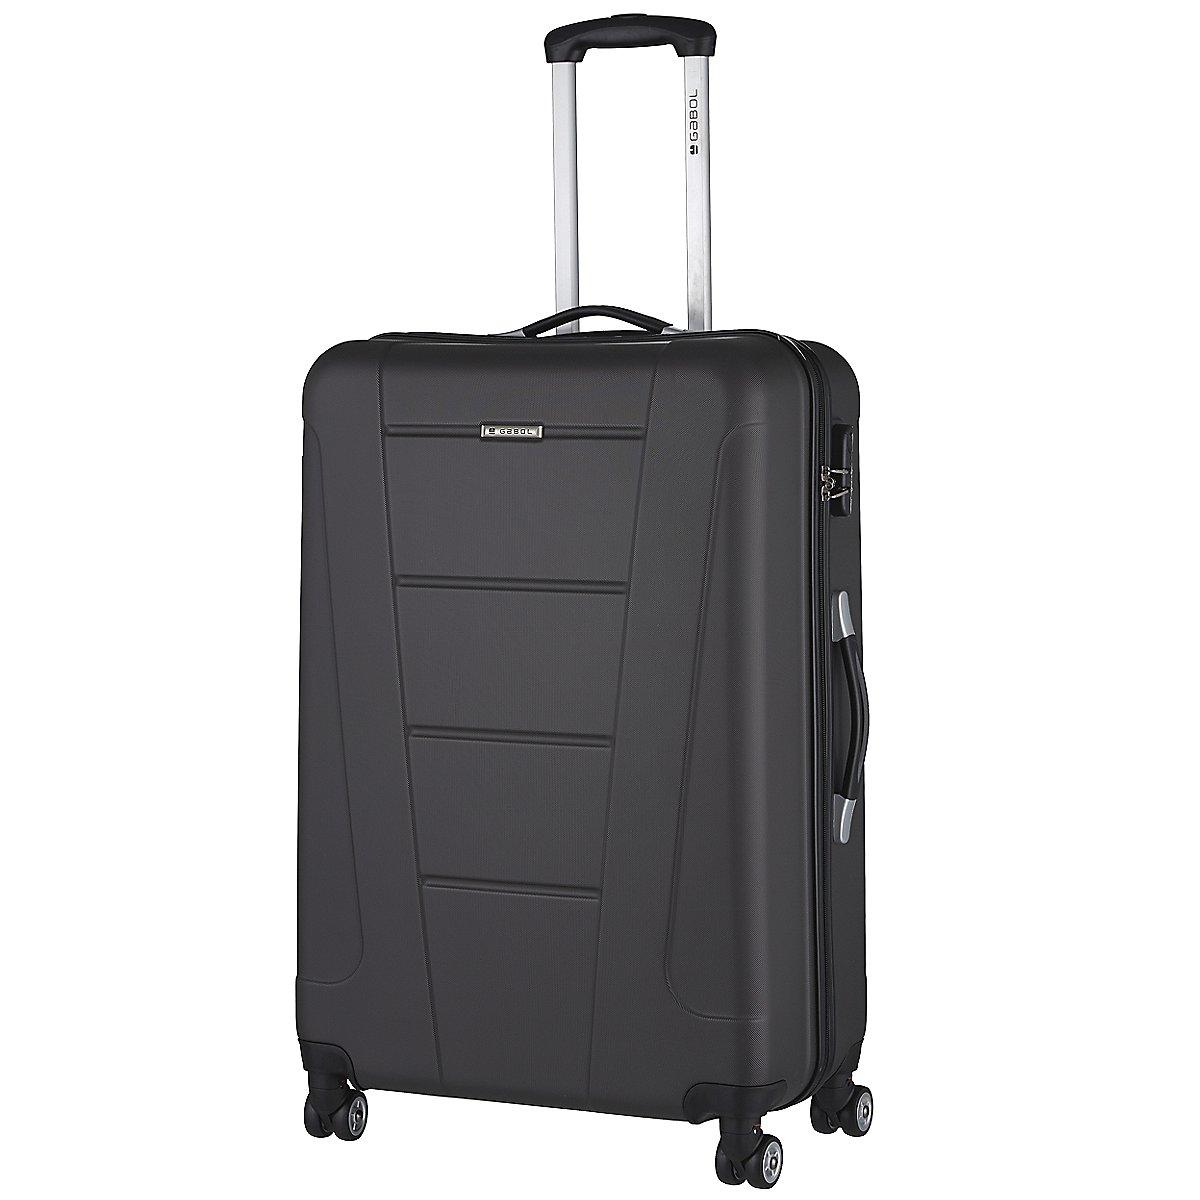 gabol boston 4 rollen trolley 66 cm koffer. Black Bedroom Furniture Sets. Home Design Ideas